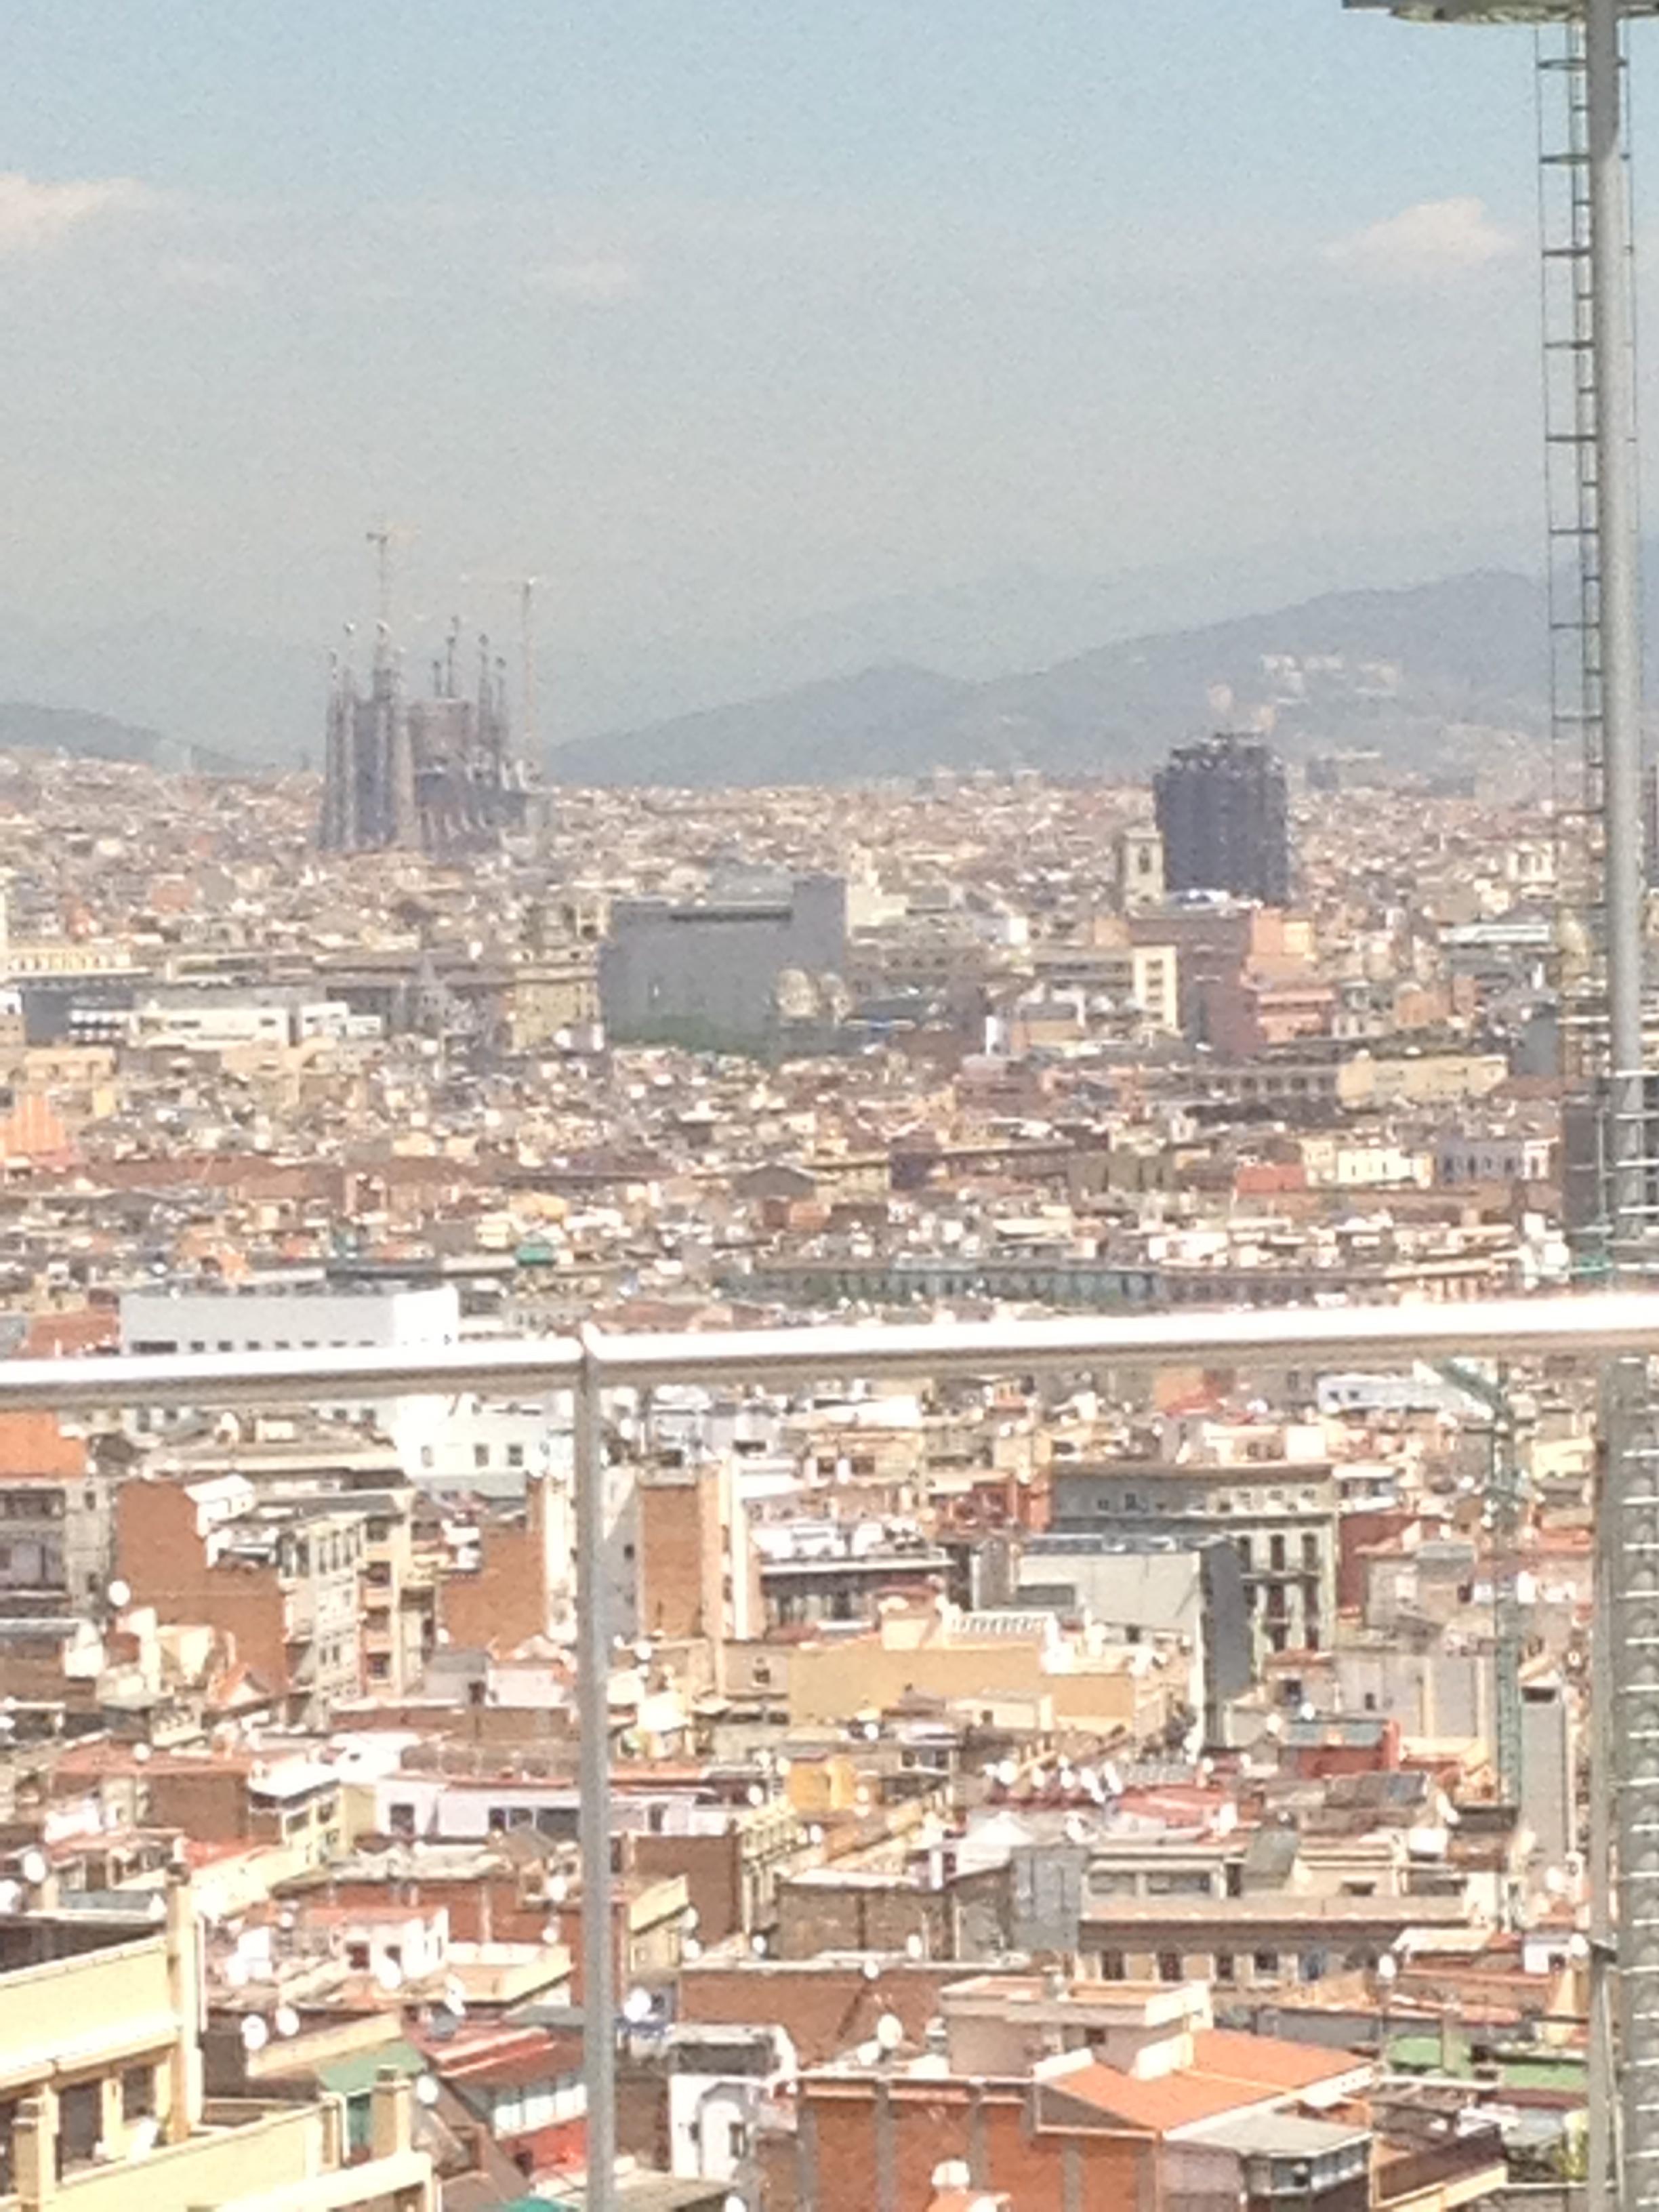 Barcelona and Famiglia